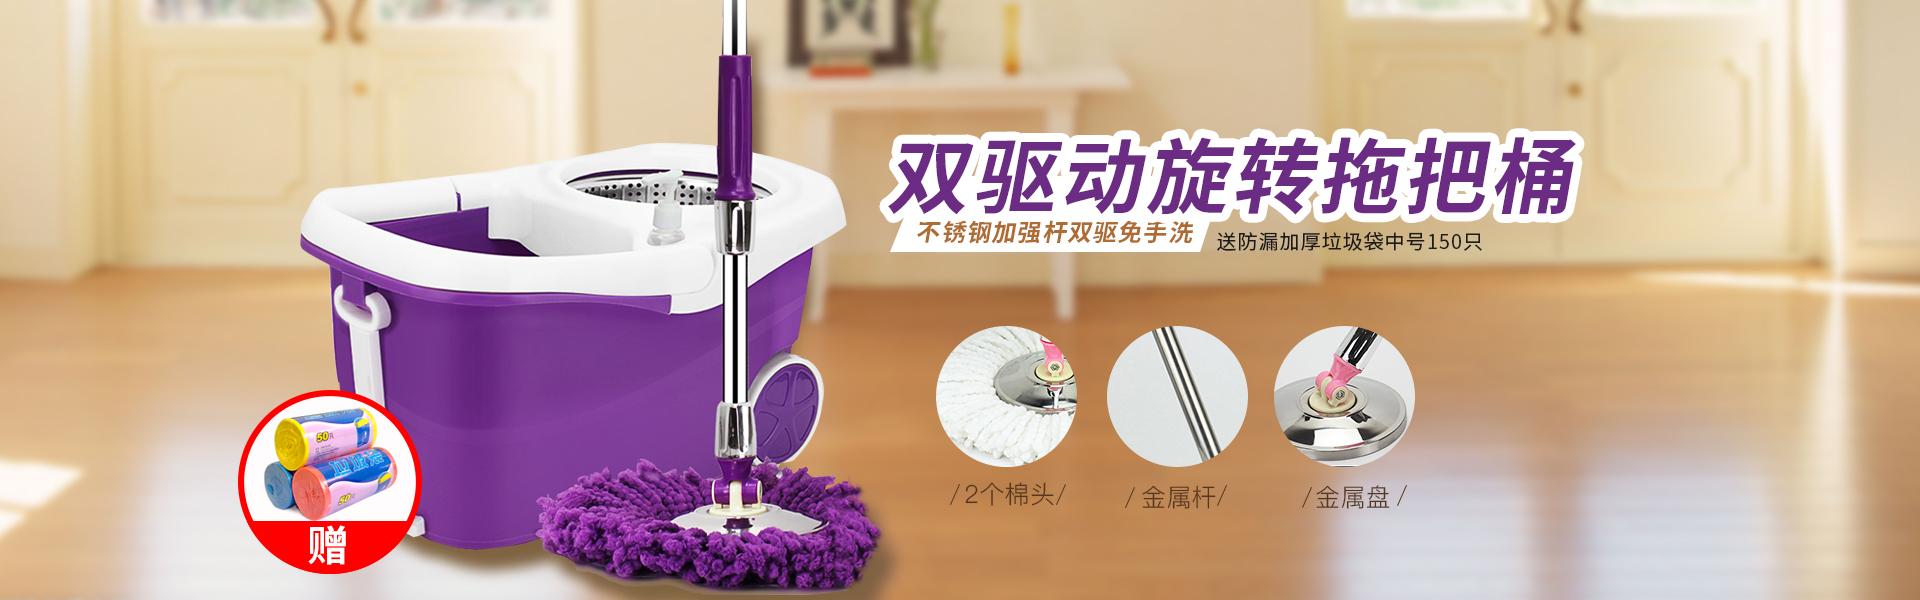 kitchen trash bags unique clocks 义乌仁璟家居专营店 - 京东